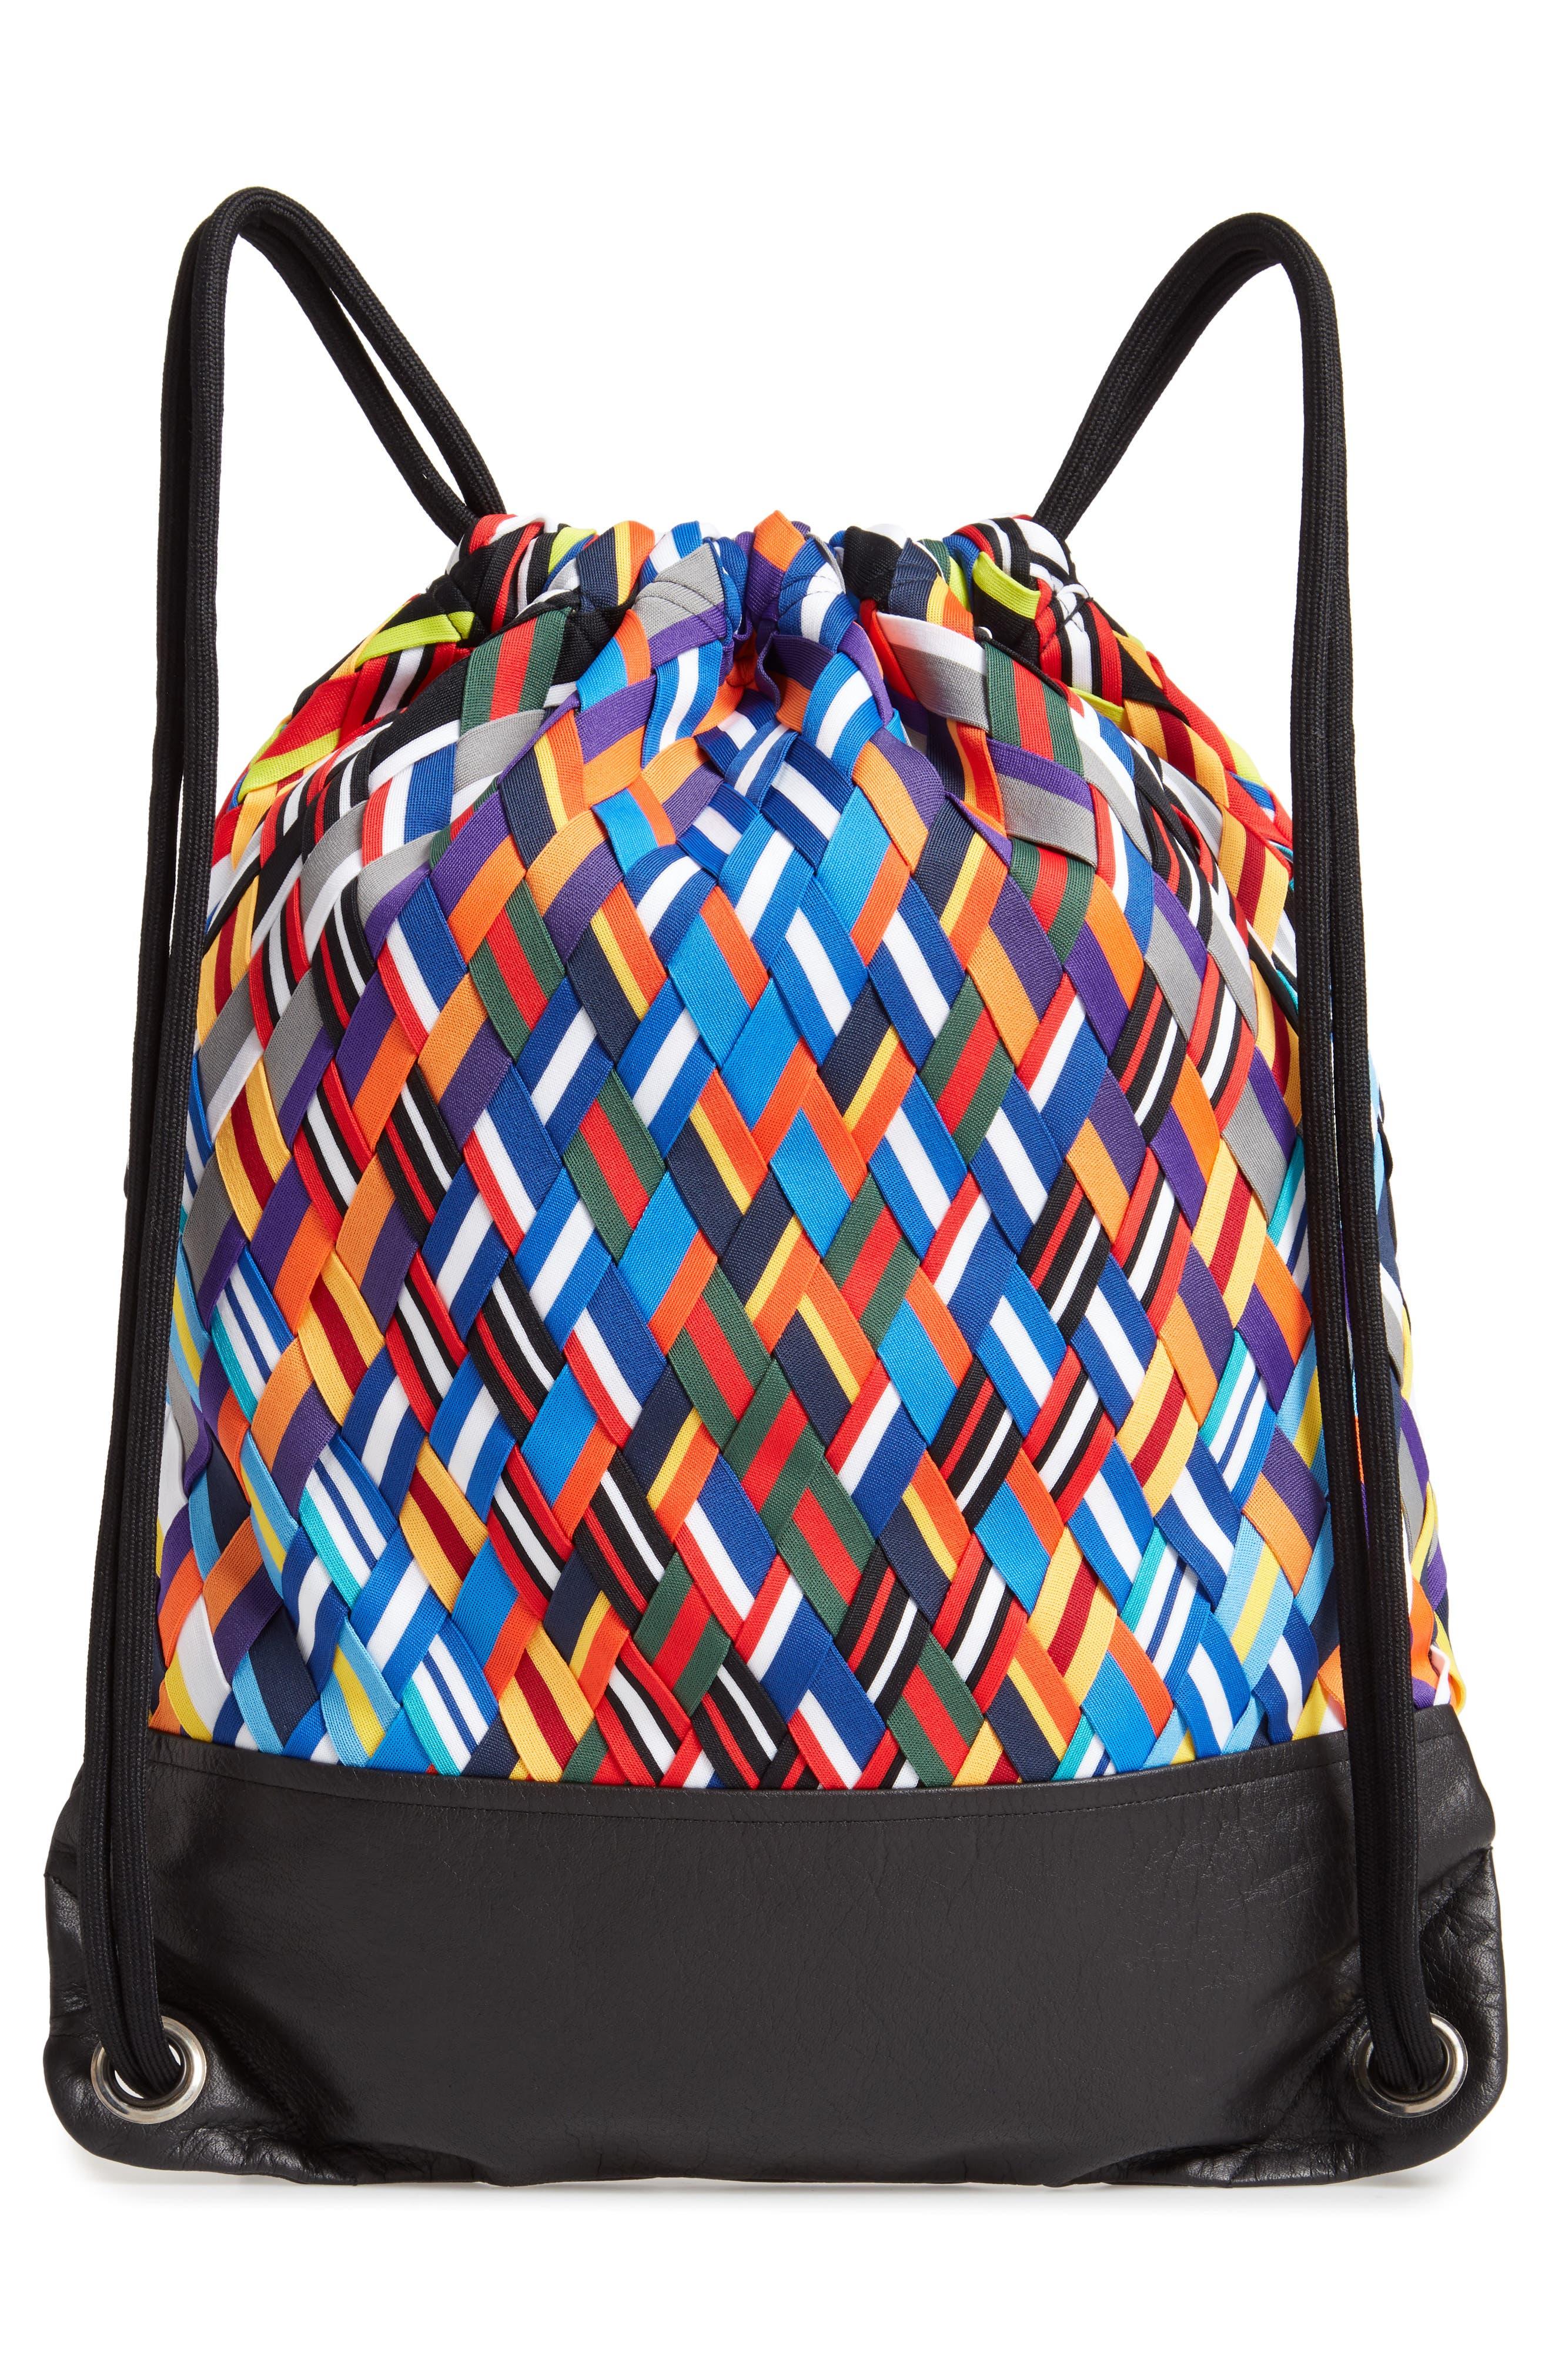 NIKE,                             NikeLab Basketball Backpack,                             Alternate thumbnail 3, color,                             BLACK